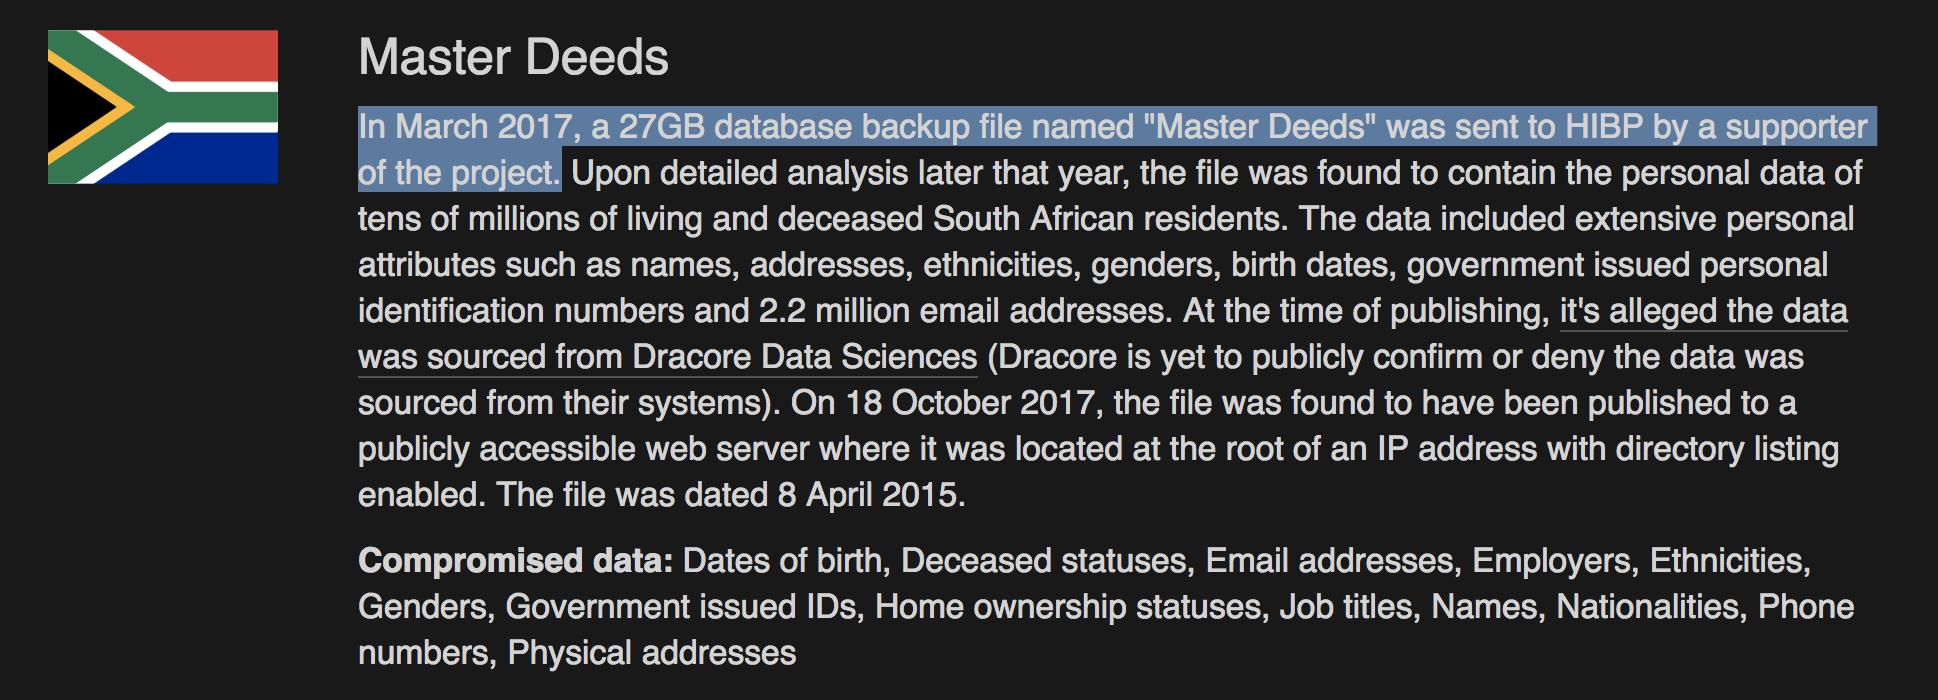 South African Master Deeds data leaked via MySQL data dump